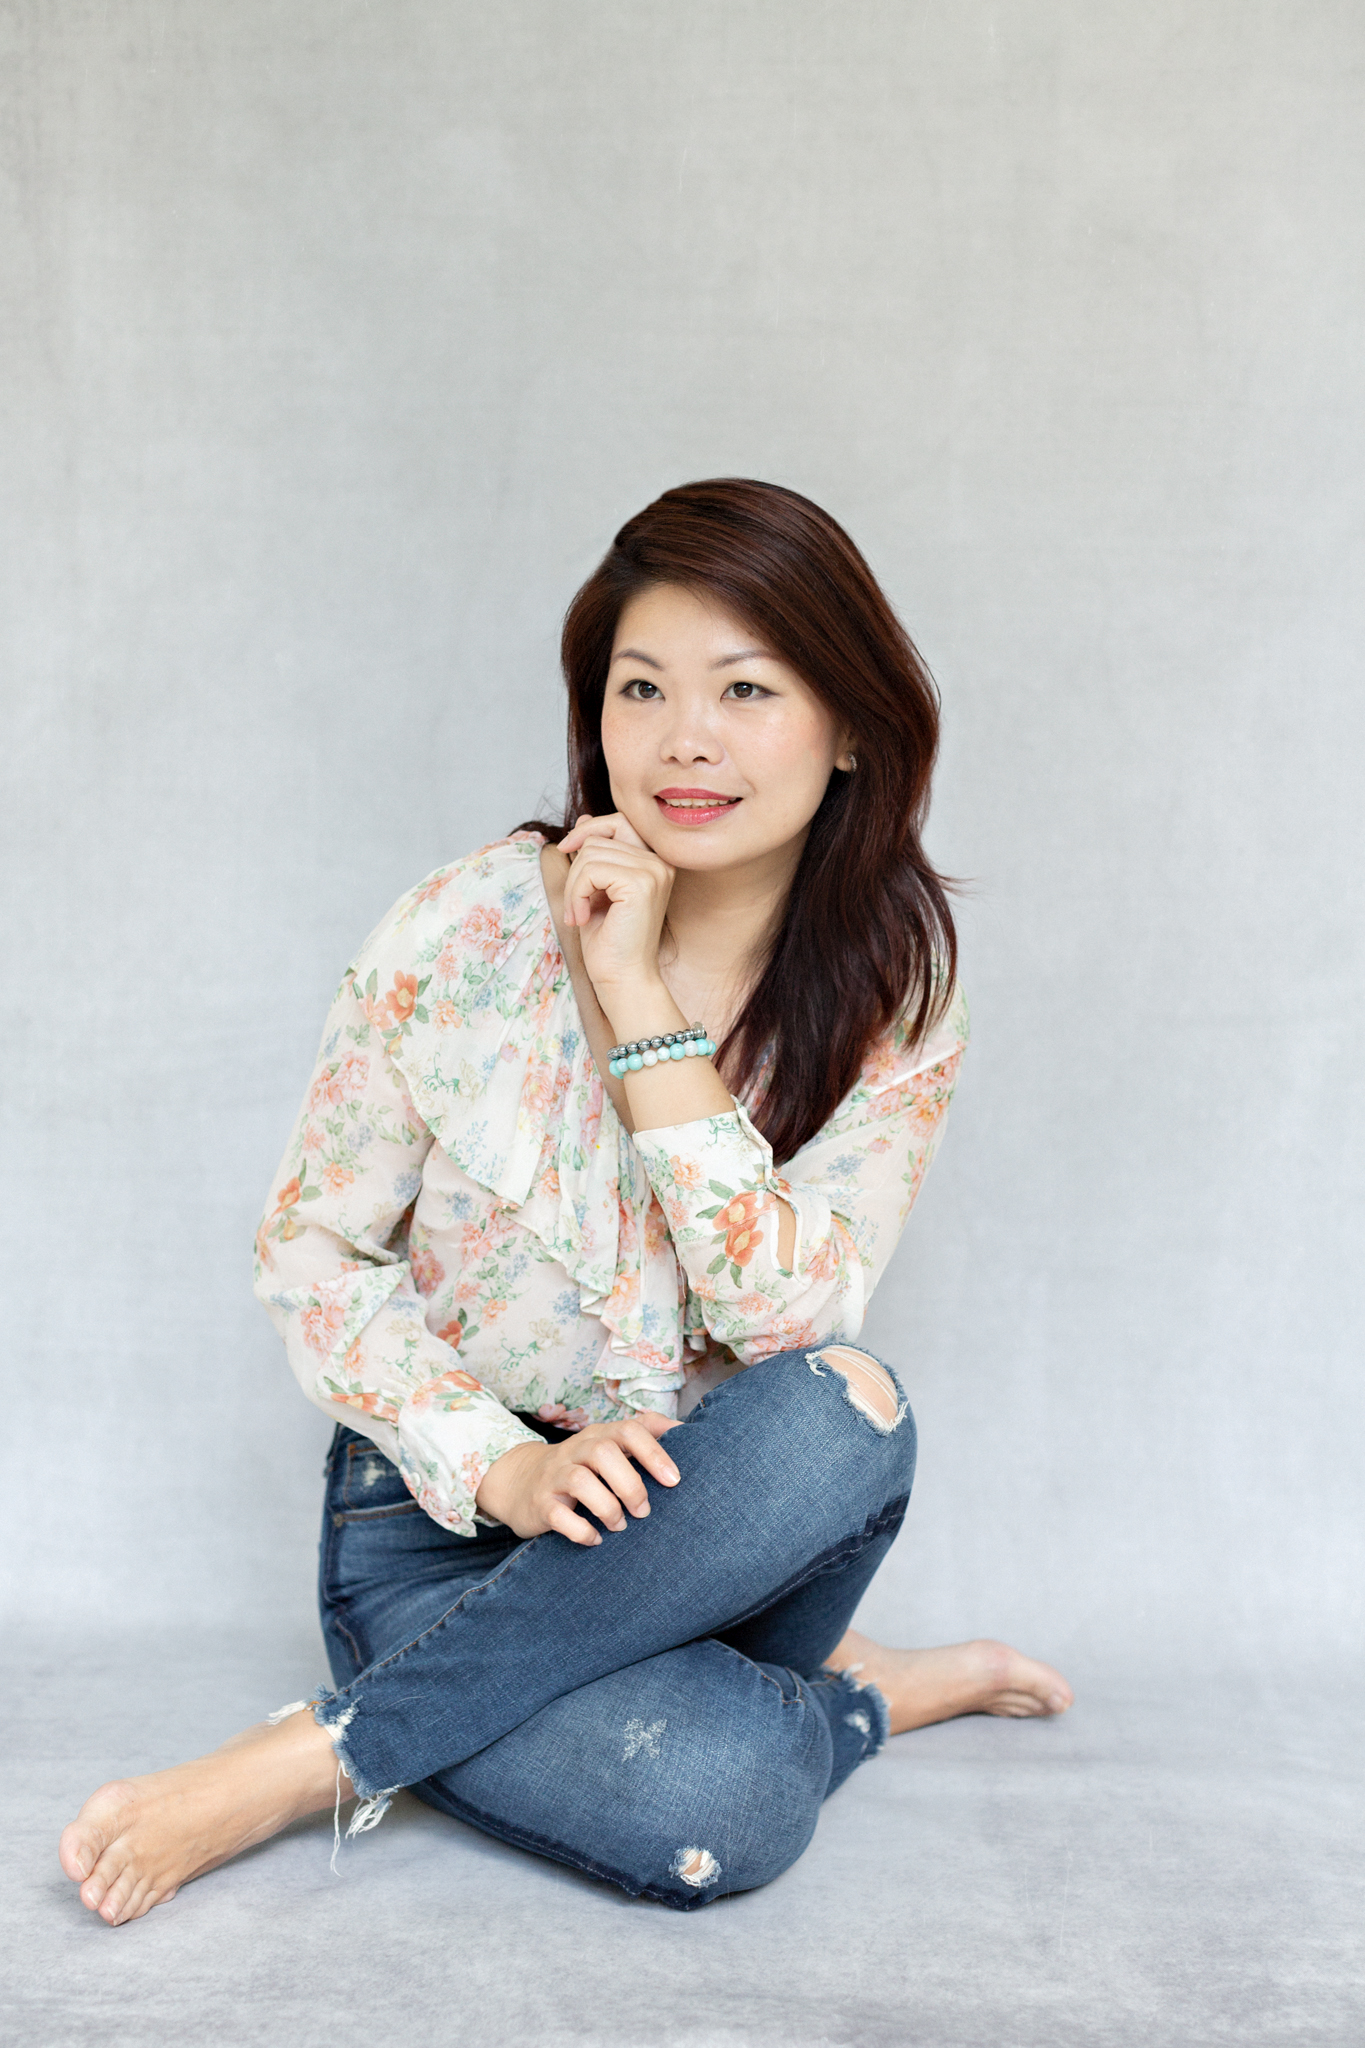 branding photographer singapore